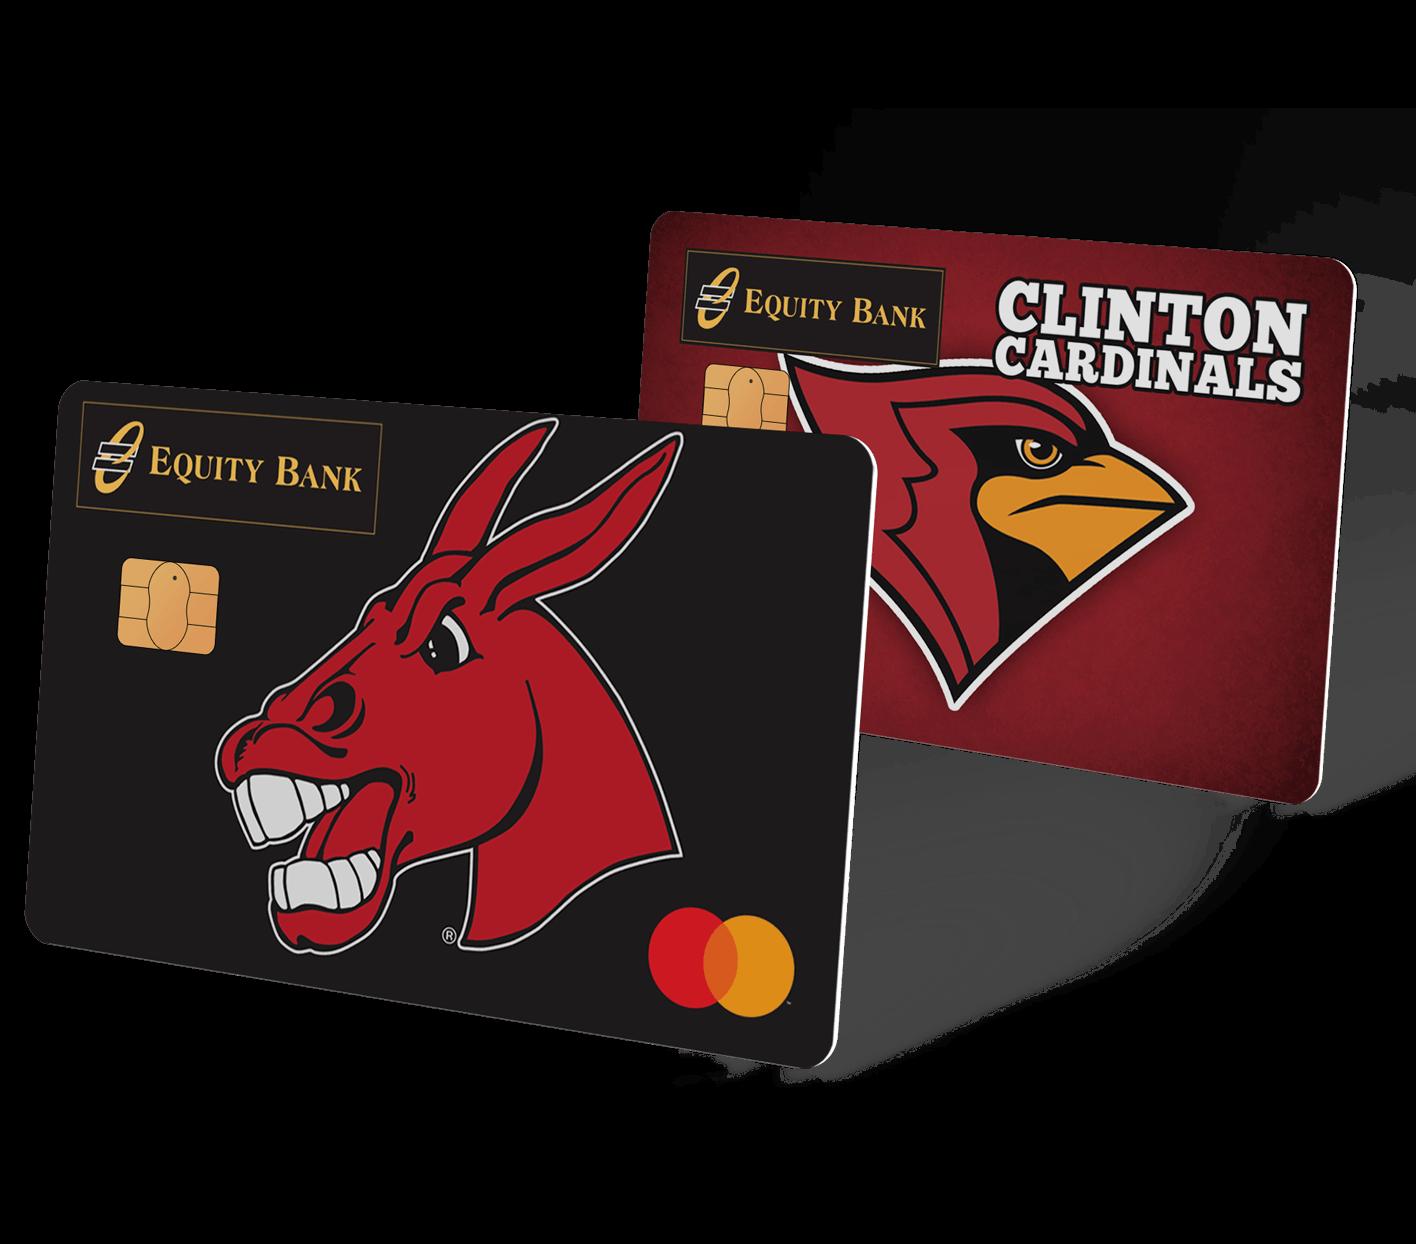 Two custom debit card designs